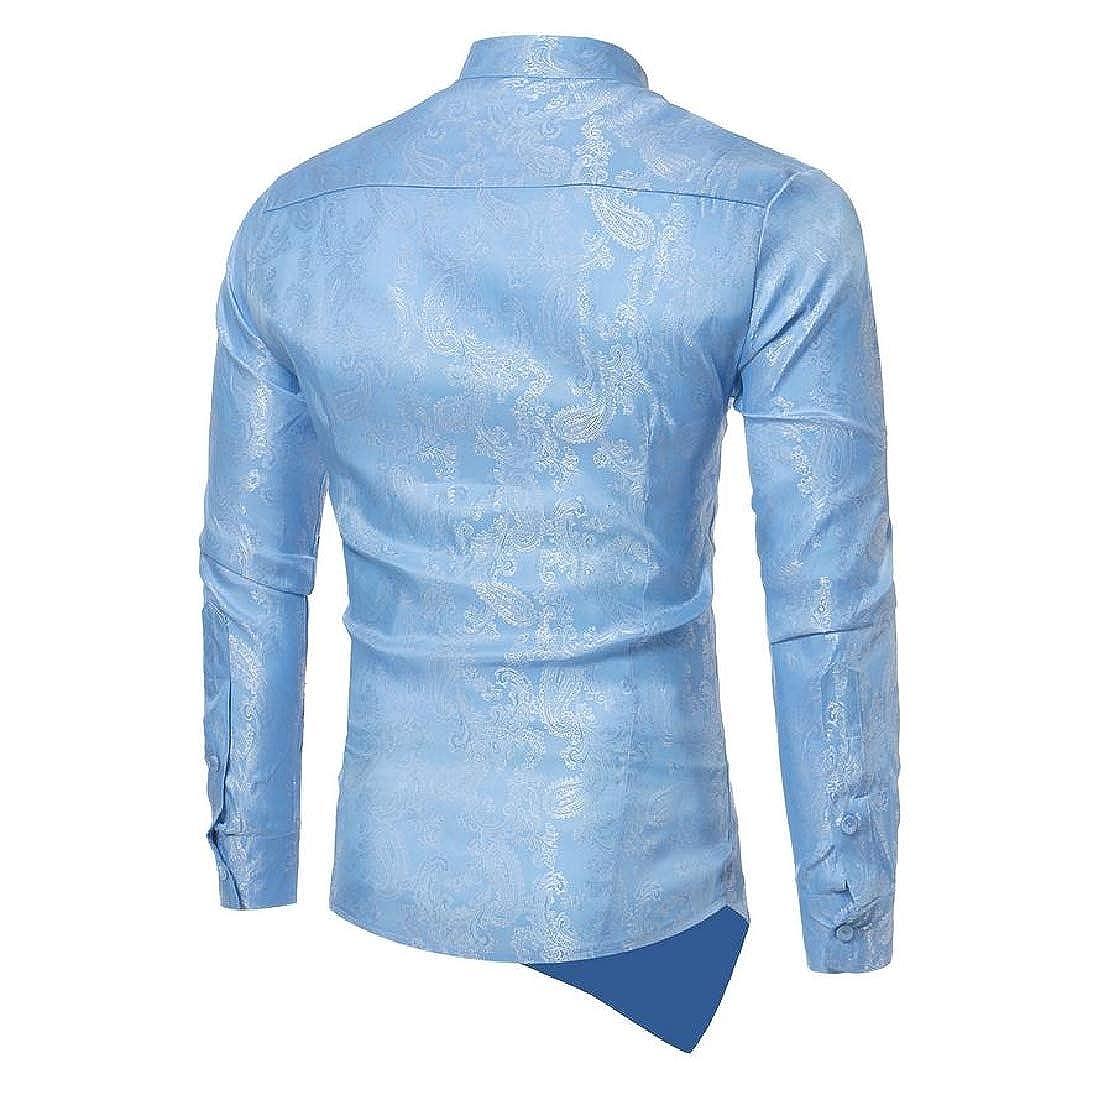 YUNY Men Button-Down-Shirts Floral Design Woven Elegant Shirts Light Blue S